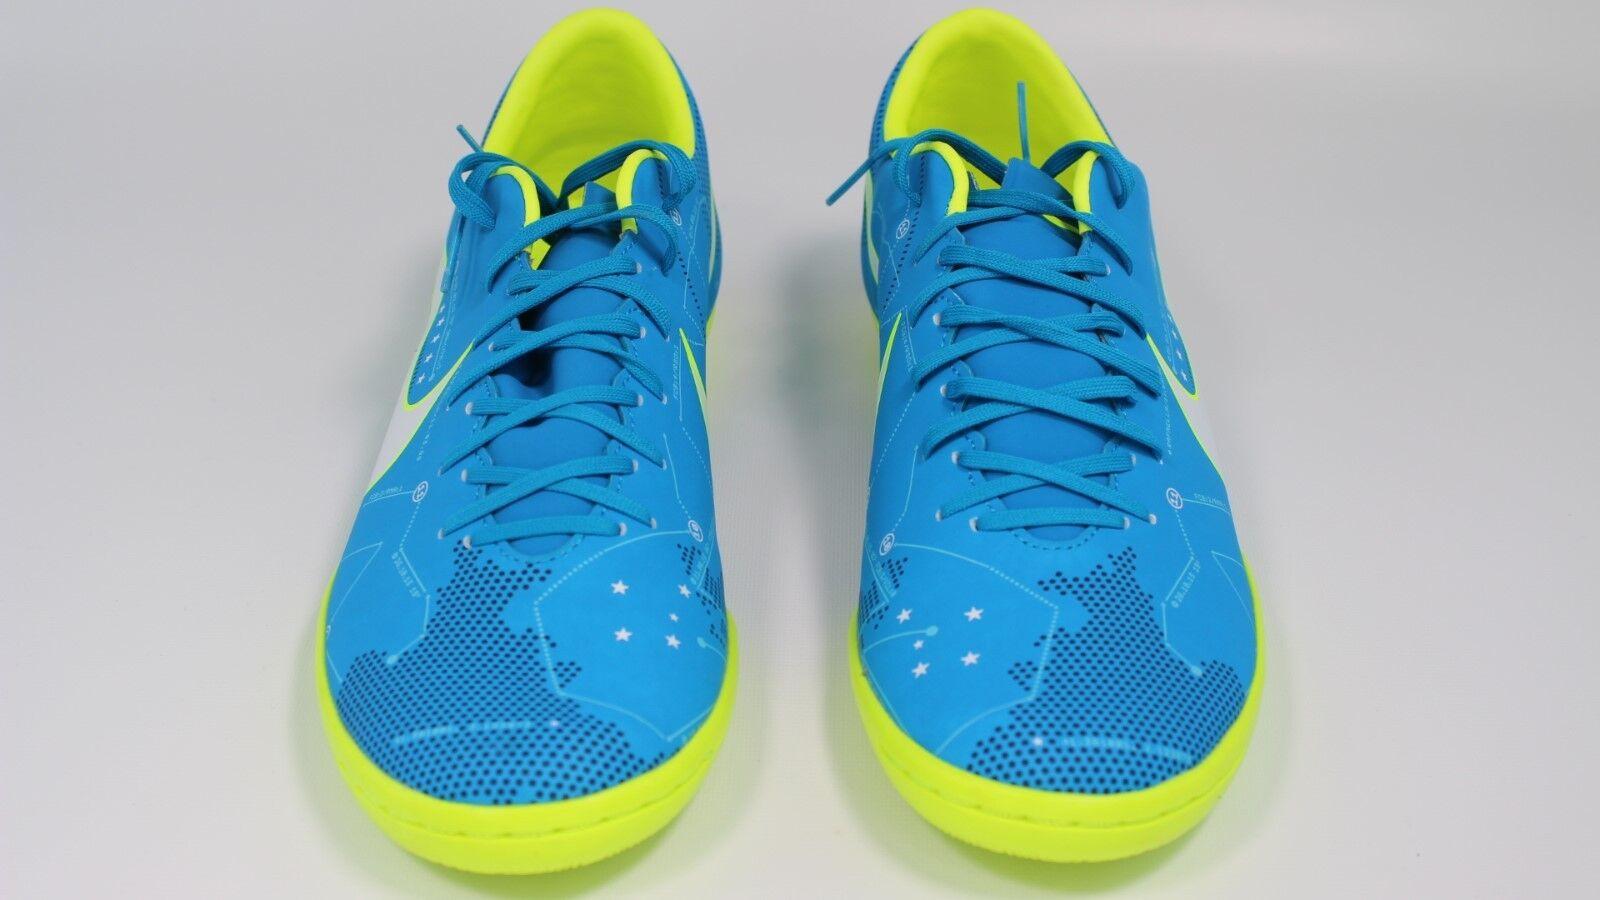 Nike Mercurialx Victory VI Neymar Jr IC, New sz 9 921516400